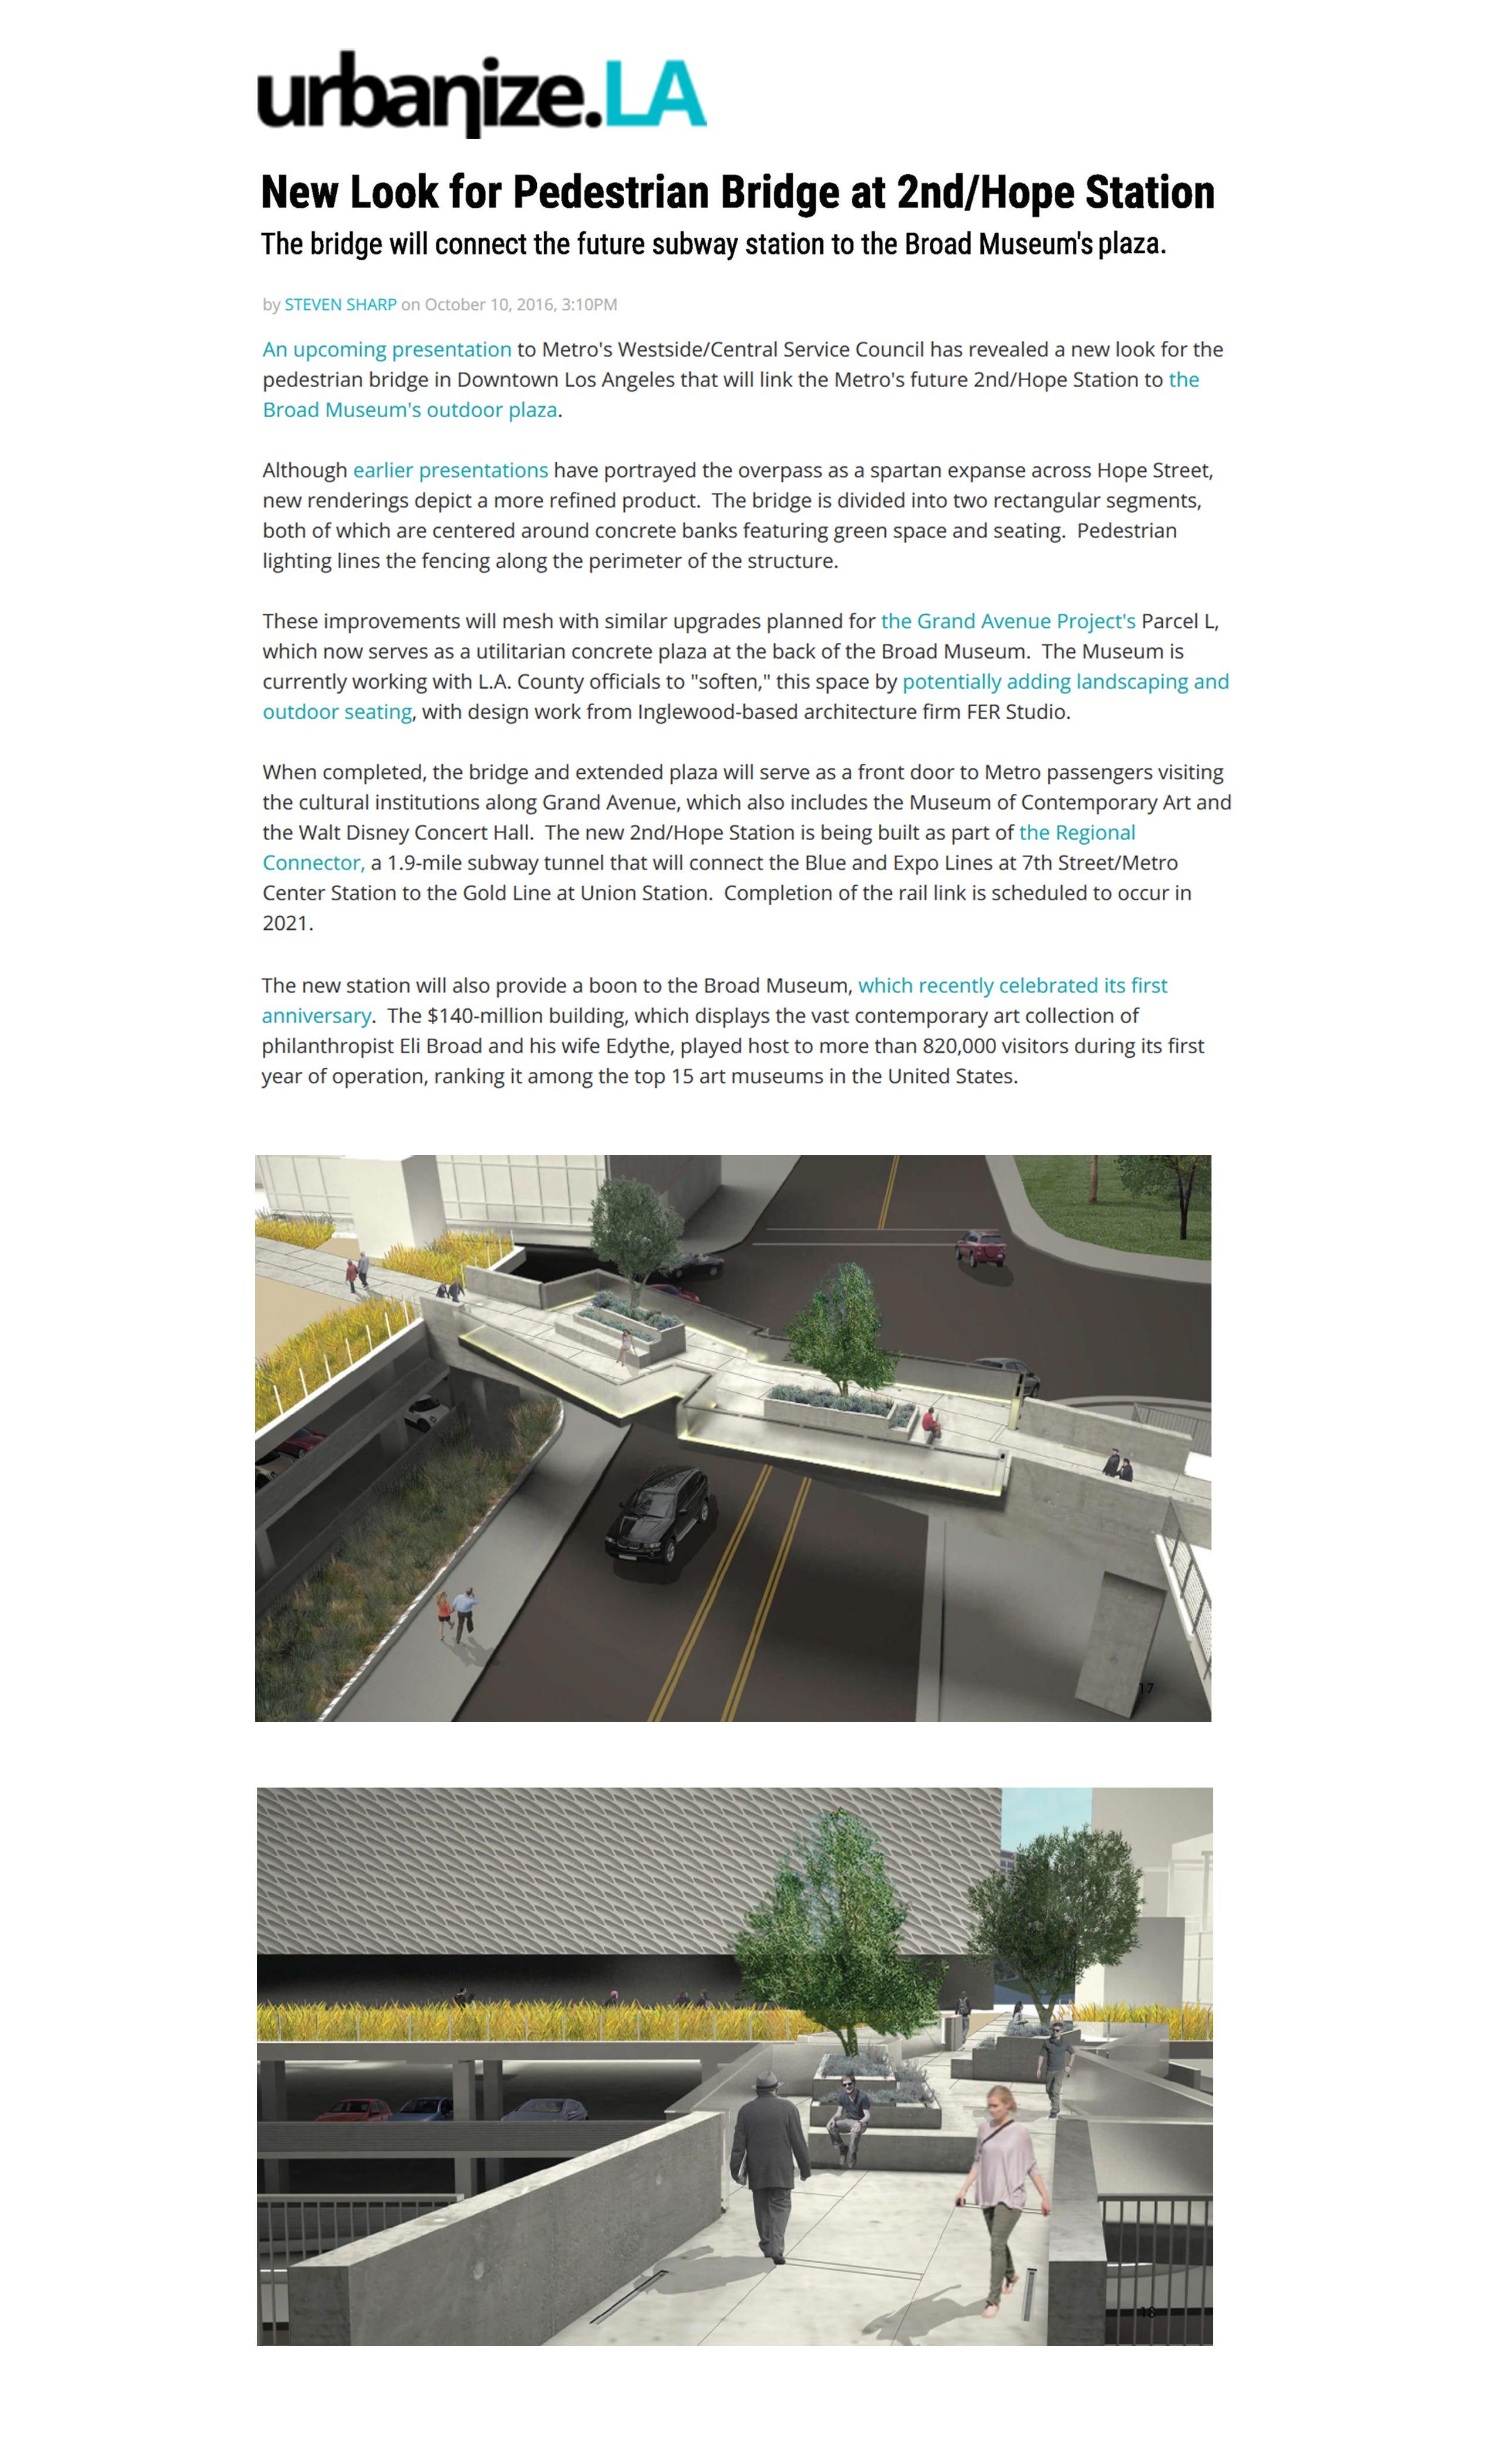 A new look for pedestrian bridge